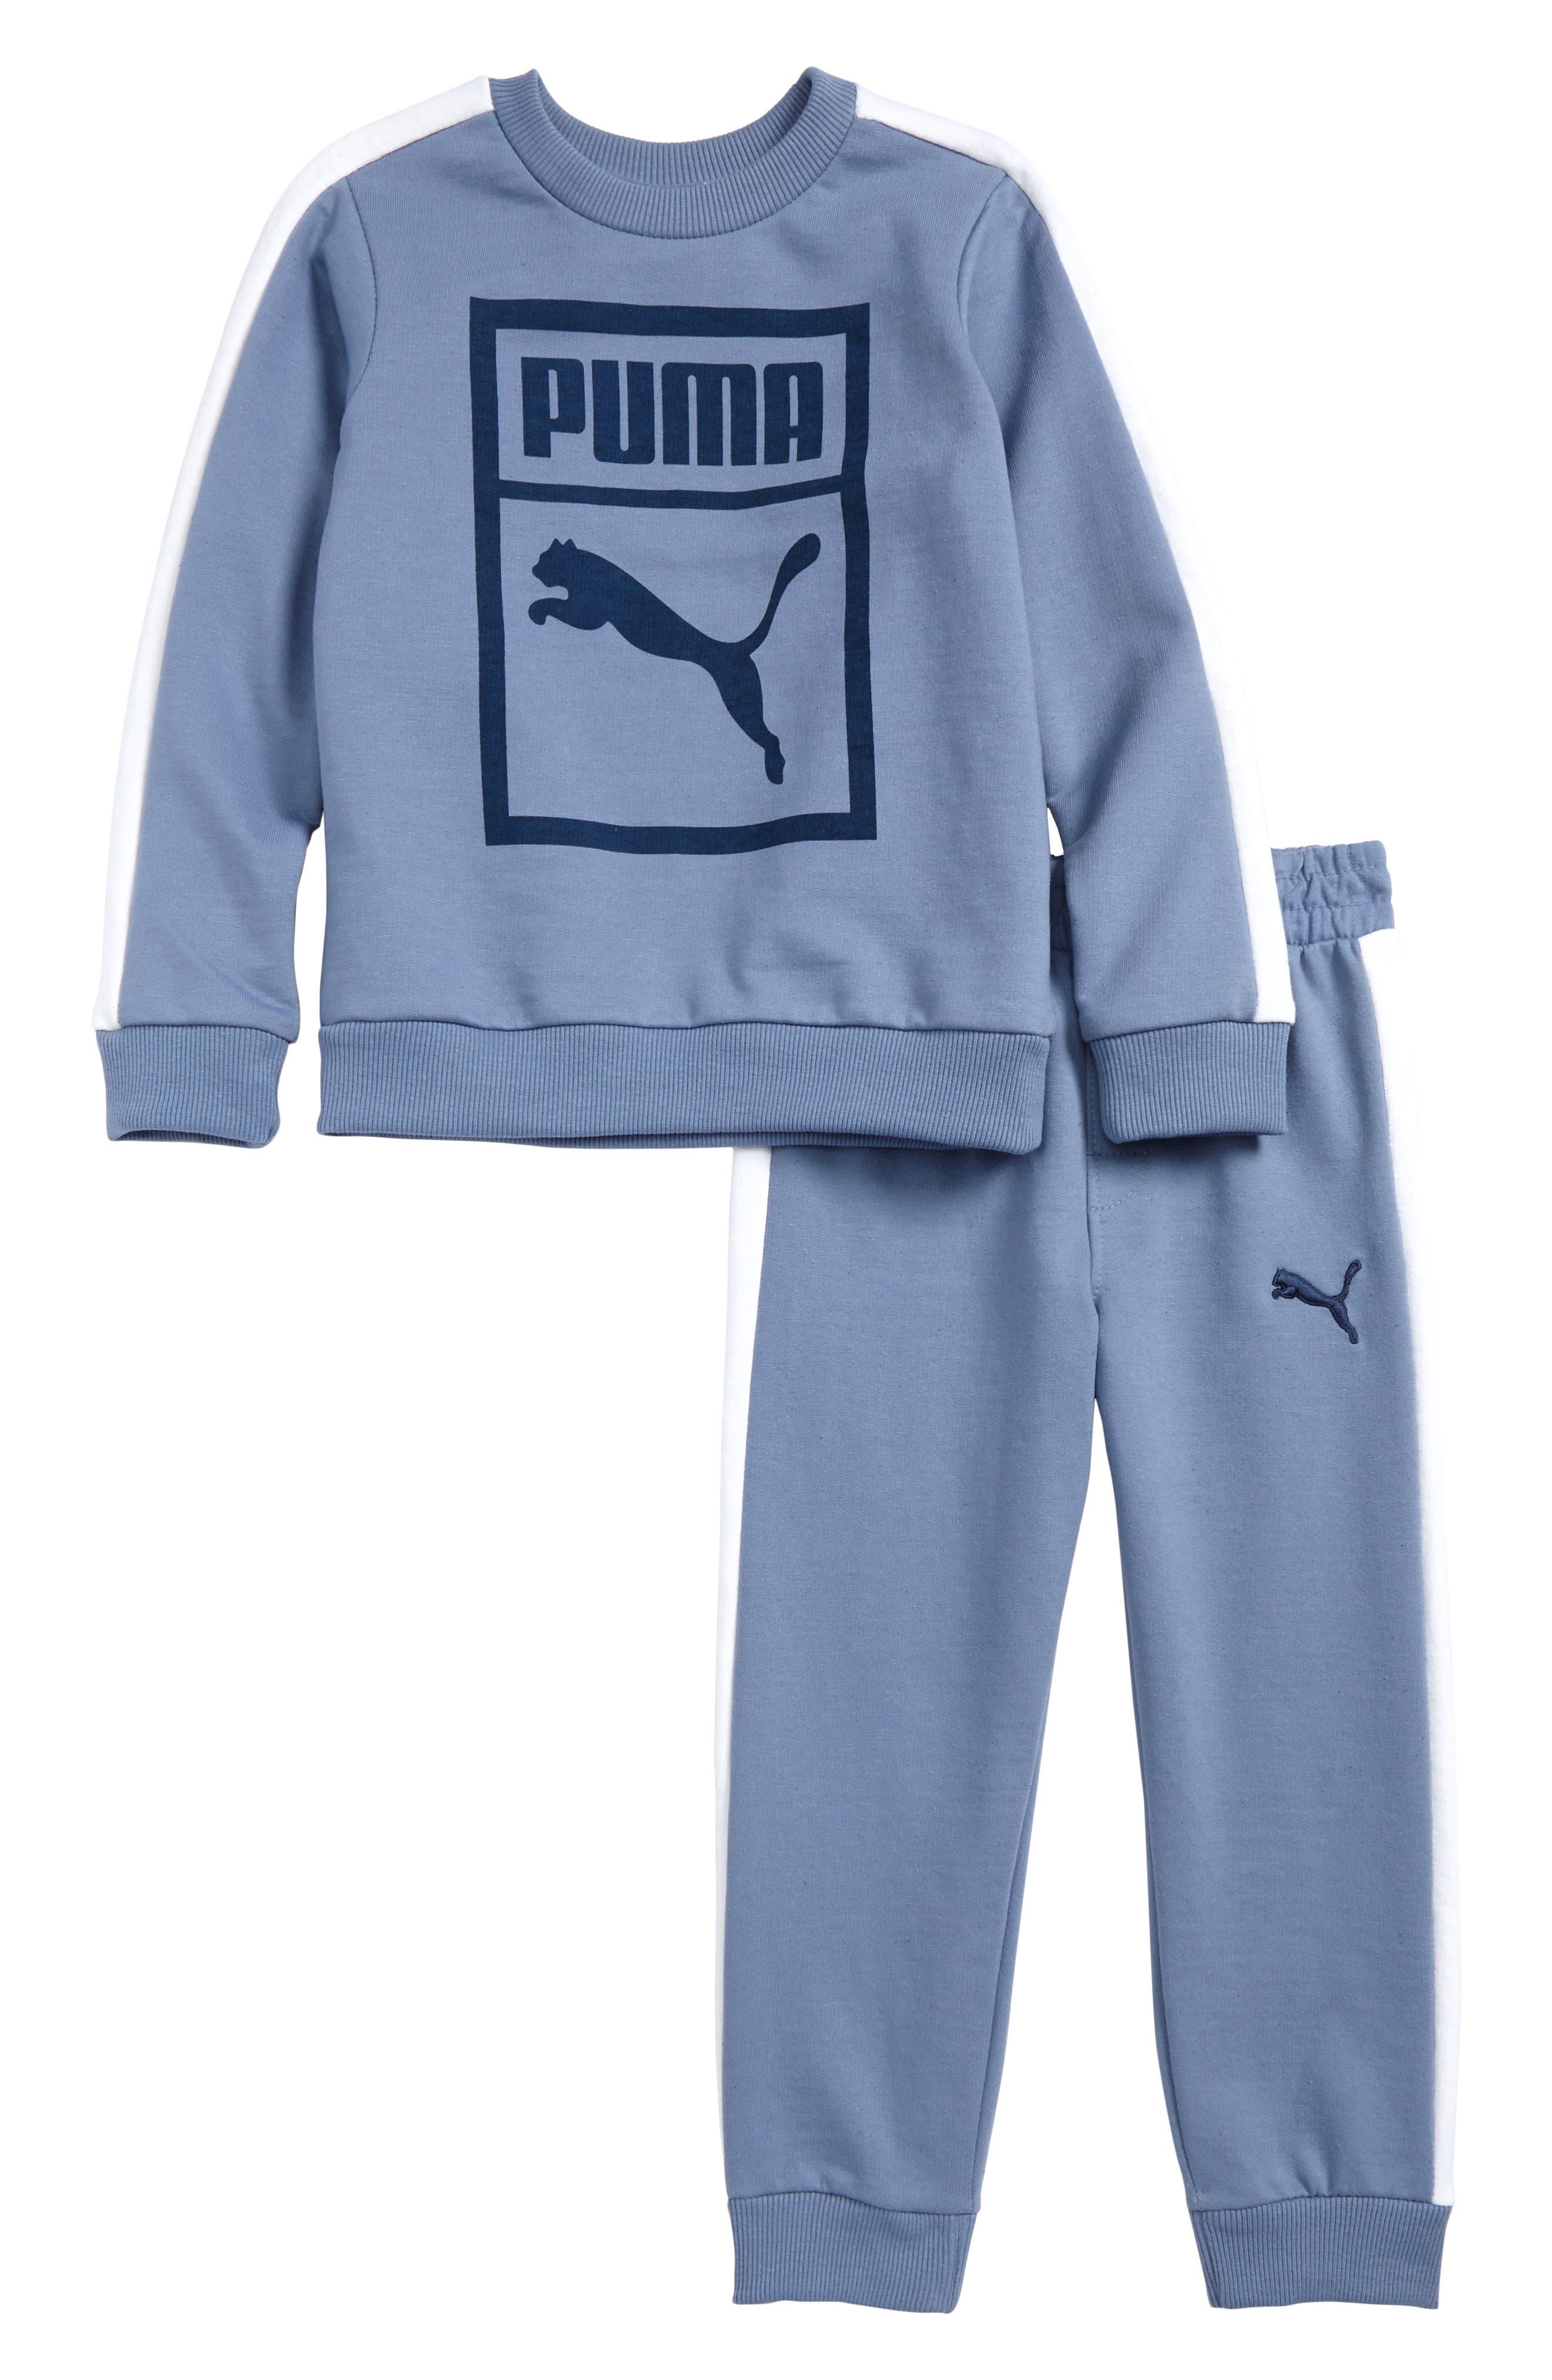 Alternate Image 1 Selected - PUMA Heritage Sweatshirt & Sweatpants Set (Toddler Boys & Little Boys)